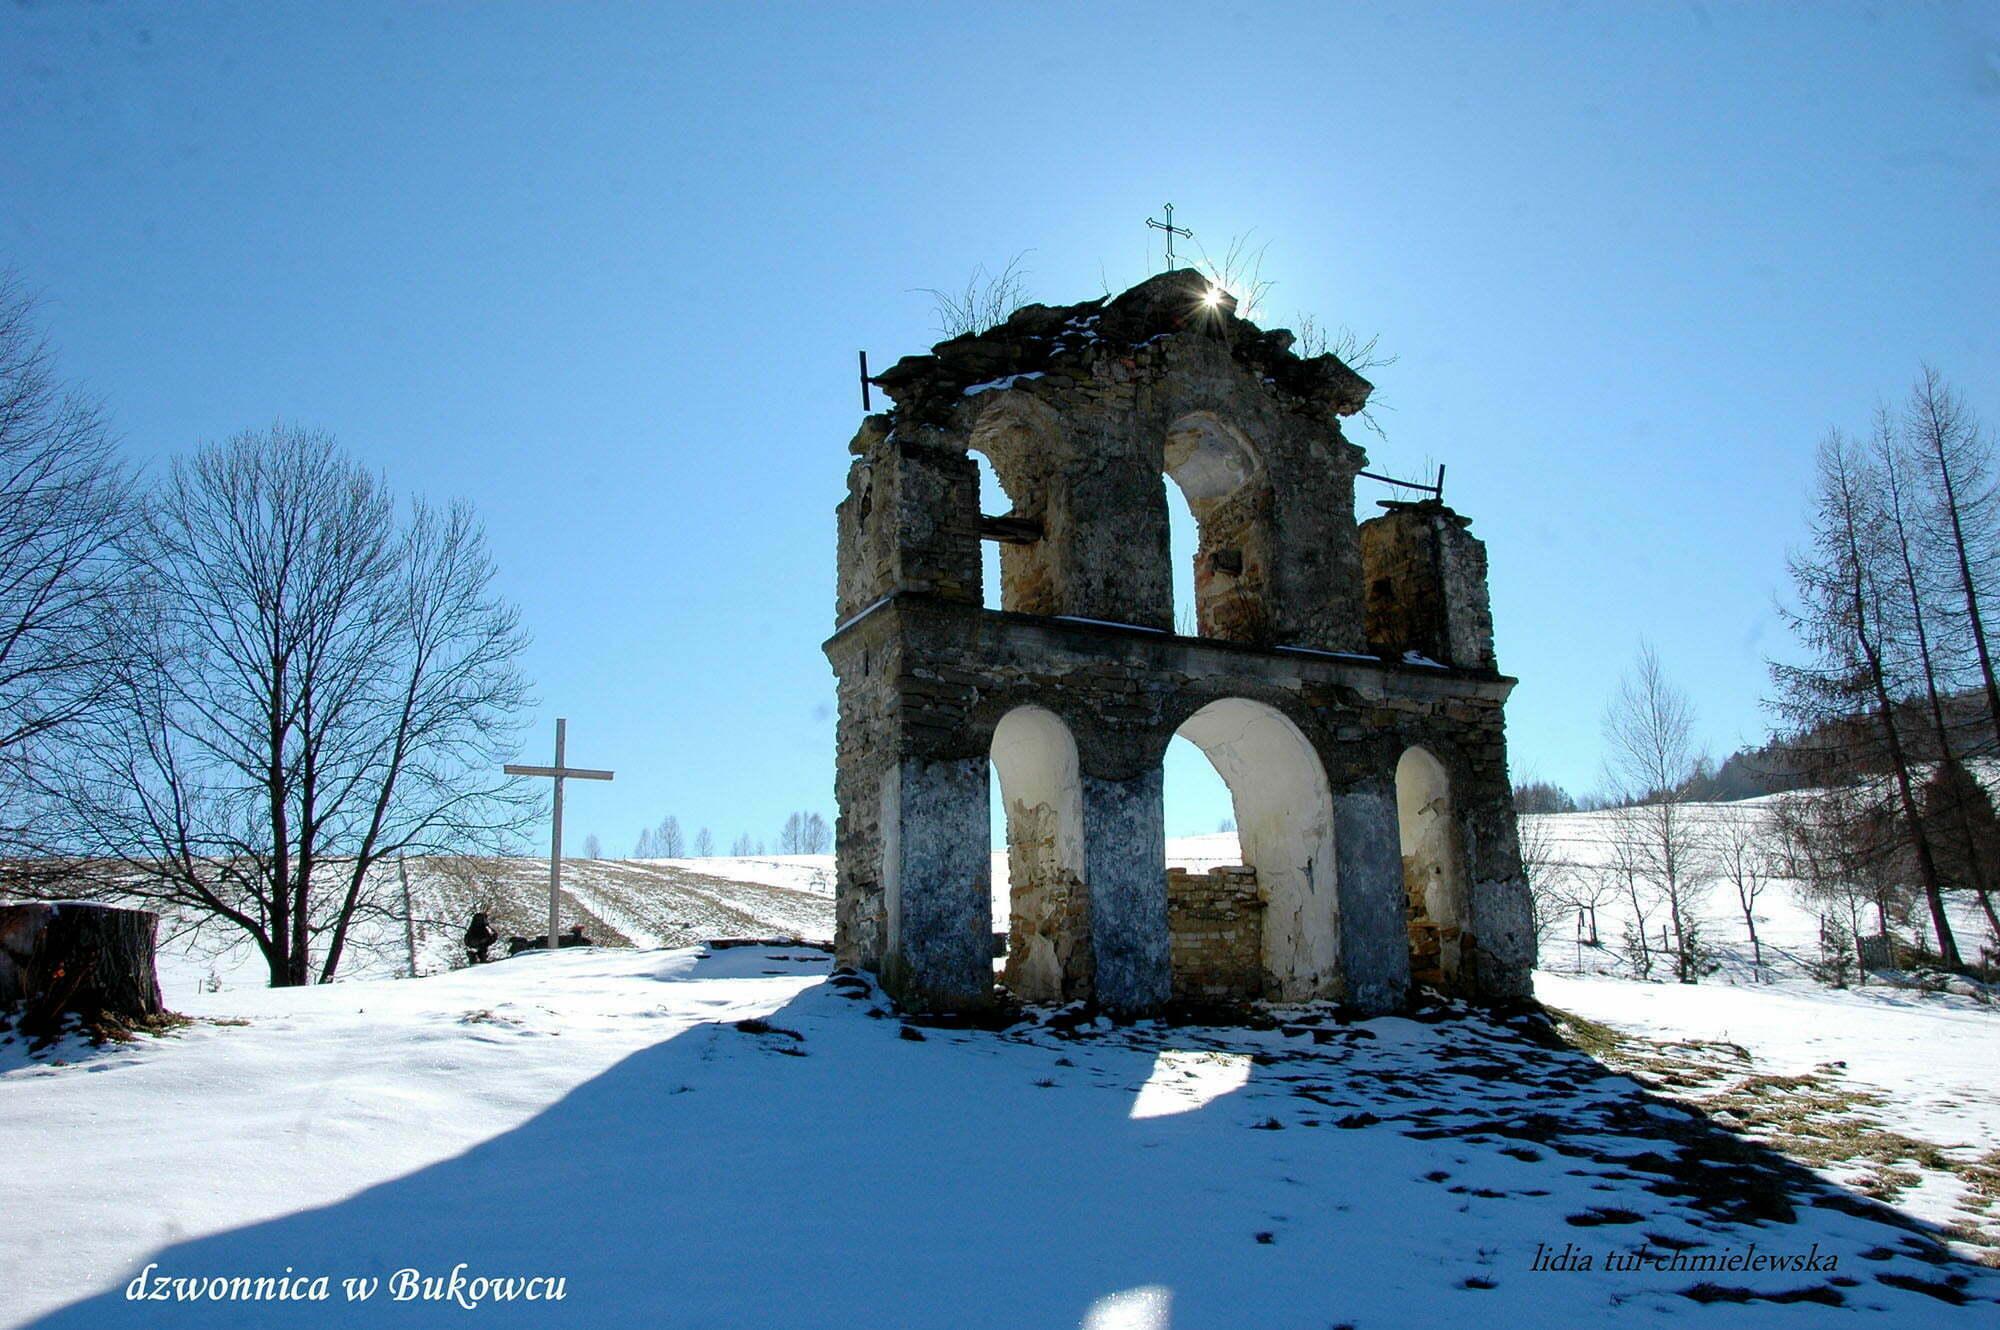 Dzwonnica w Bukowcu / fot. Lidia Tul-Chmielewska